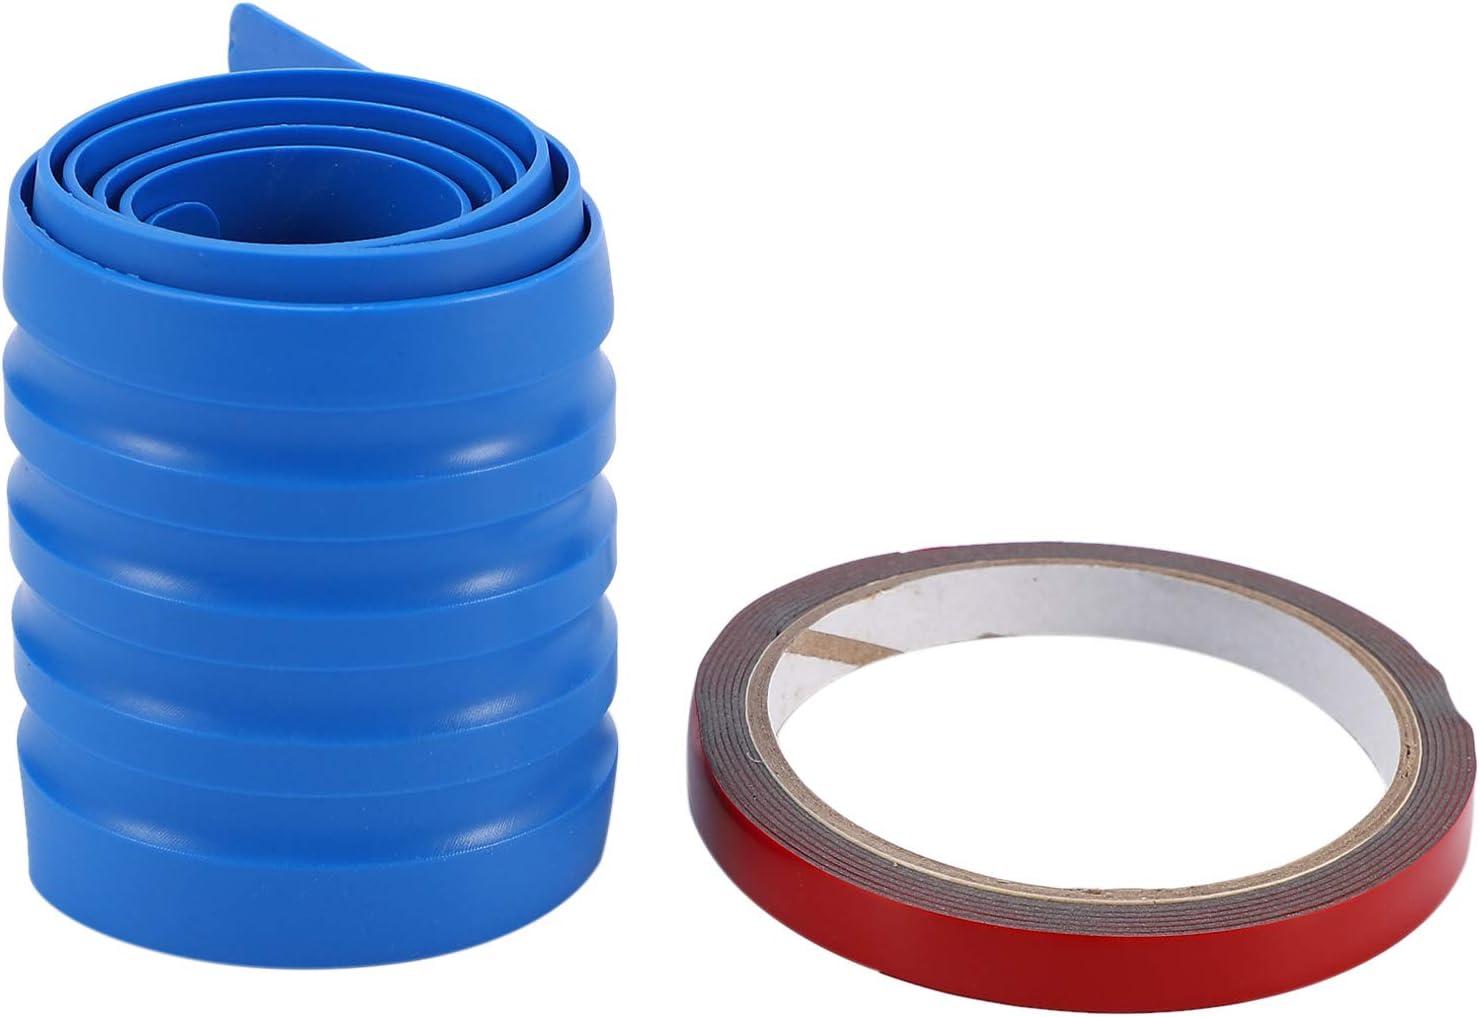 Blue Nrpfell Car Universal Trunk Bar Bumper nti-Collision nti-Rubber Tailgate Trim Strip Sill Rear Guard Sticker